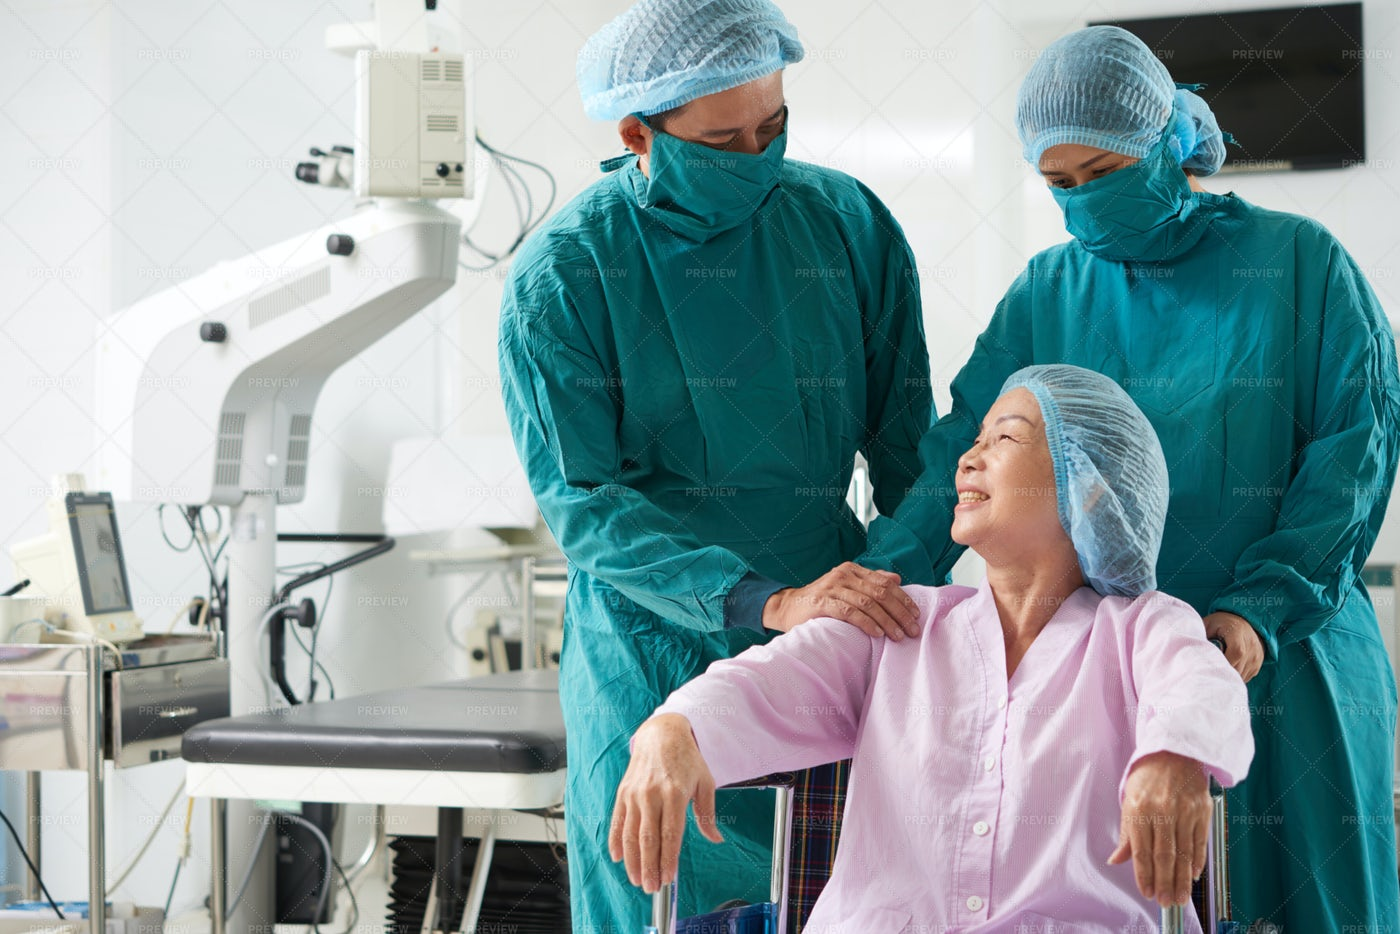 Senior Woman After Operation: Stock Photos